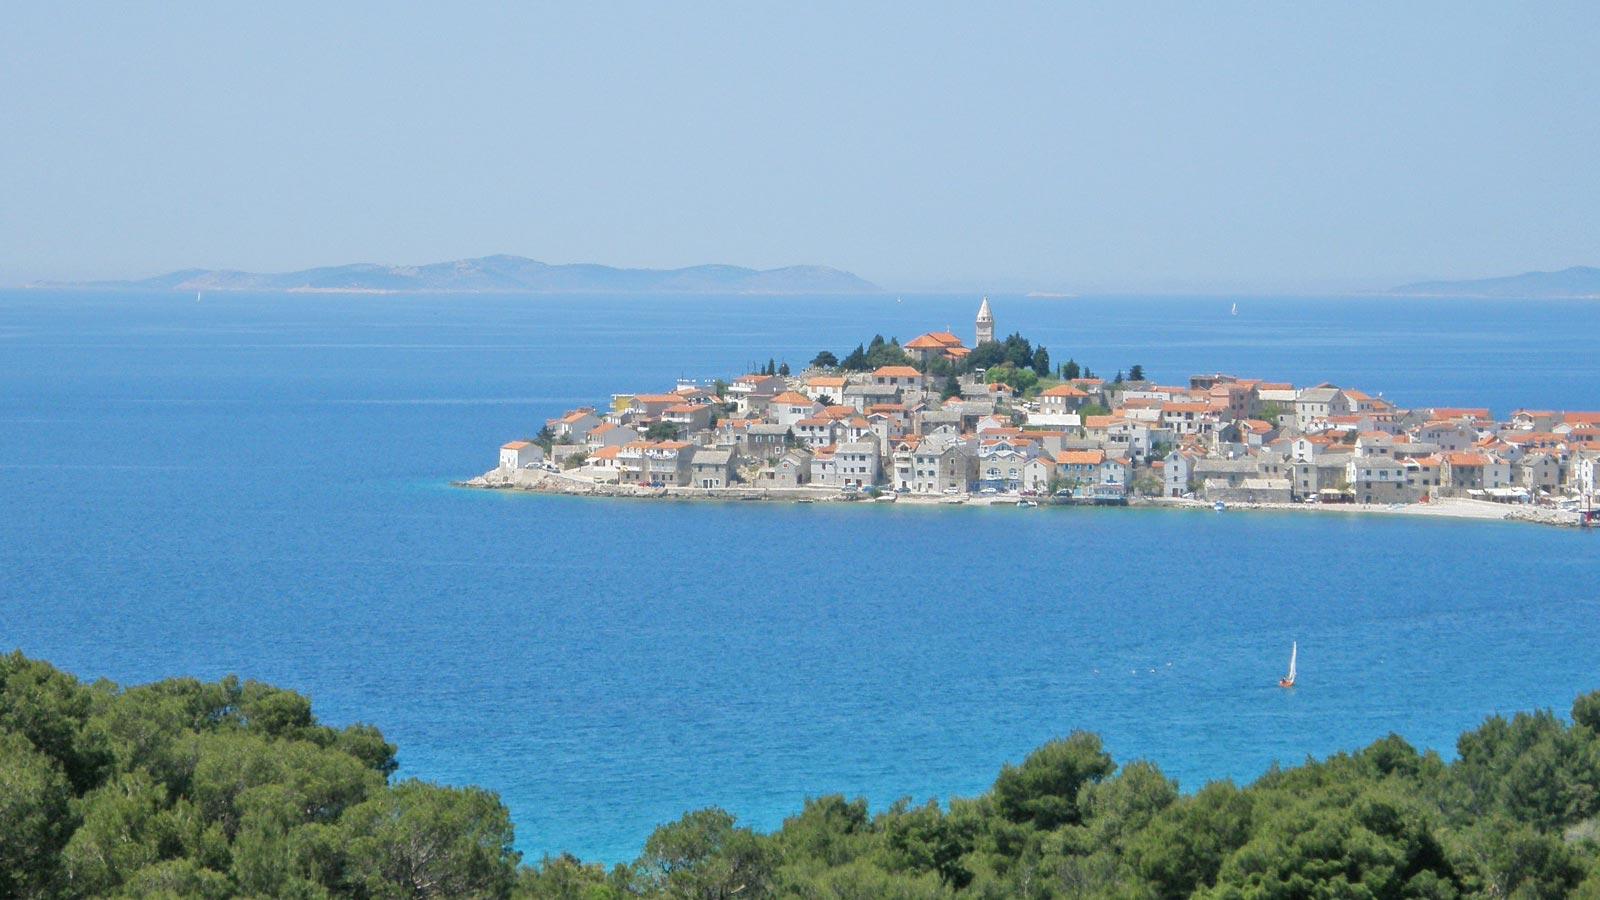 roadtrip-croatia-primosten-island-yoniquenews